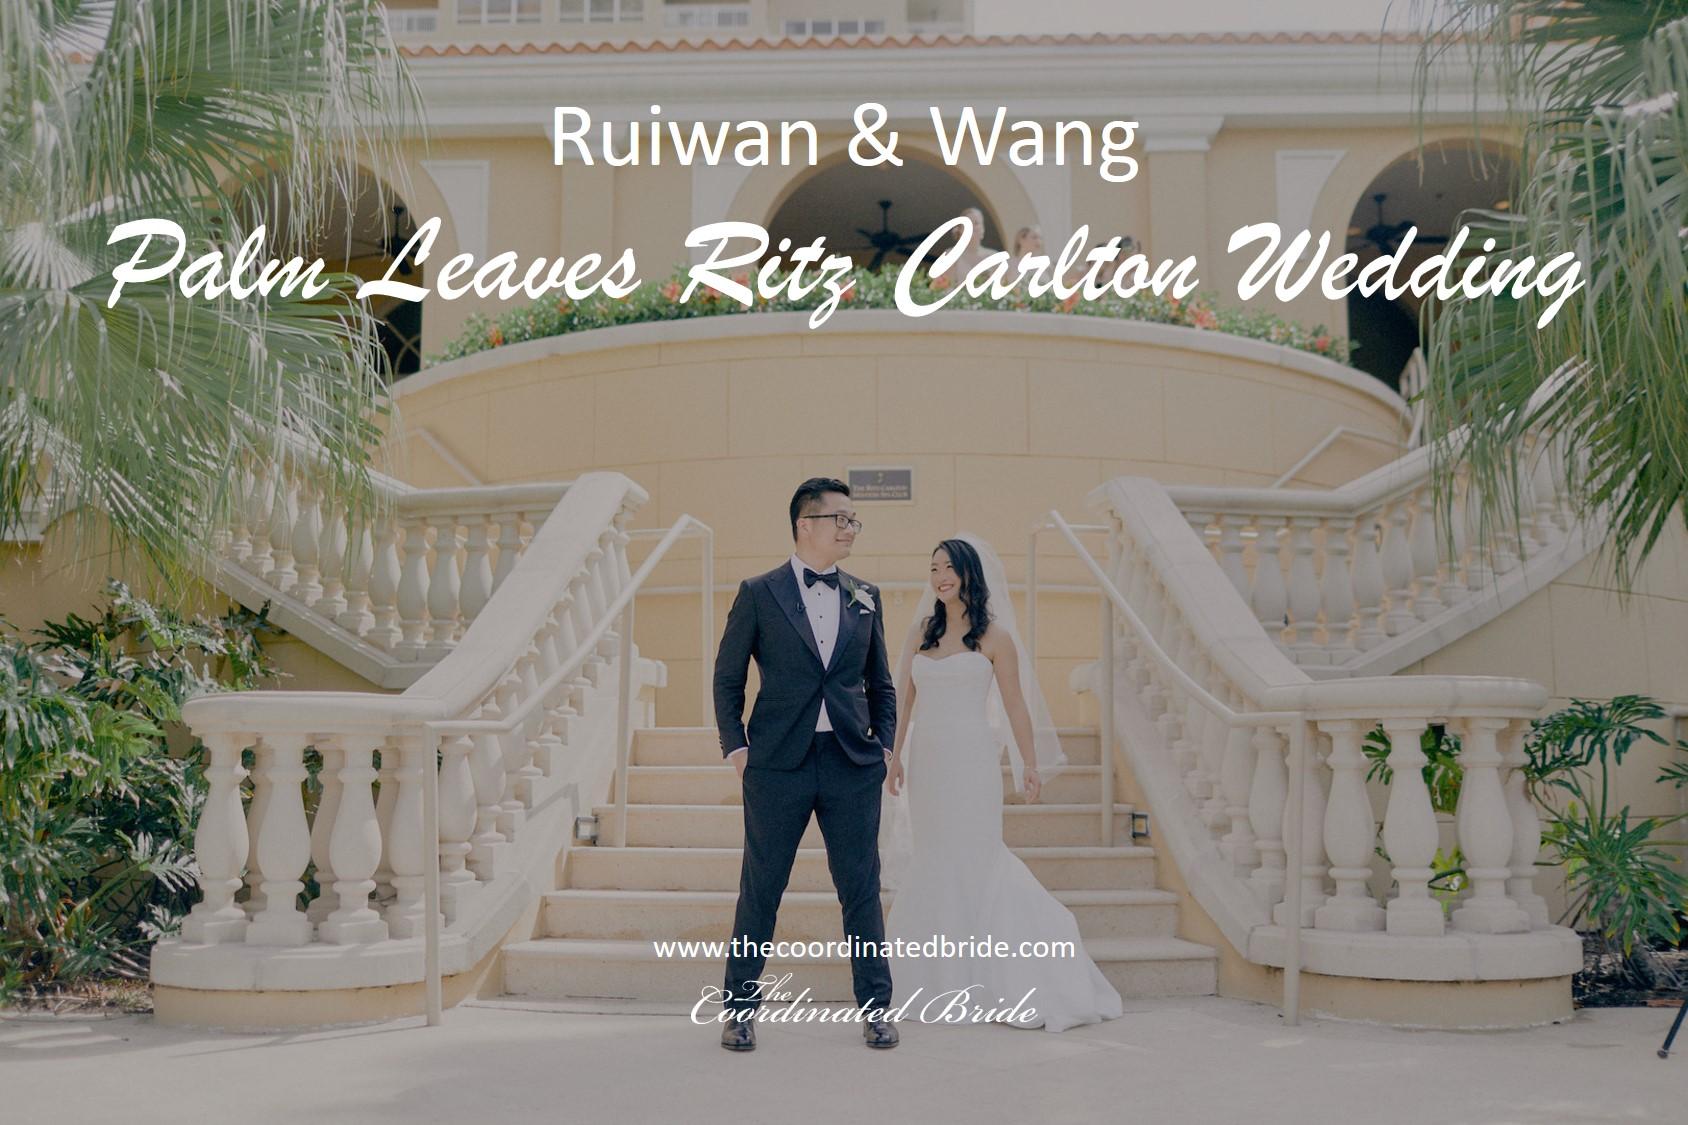 Palm Leaves Inspired Ritz Carlton Wedding, Ruiwan & Wang